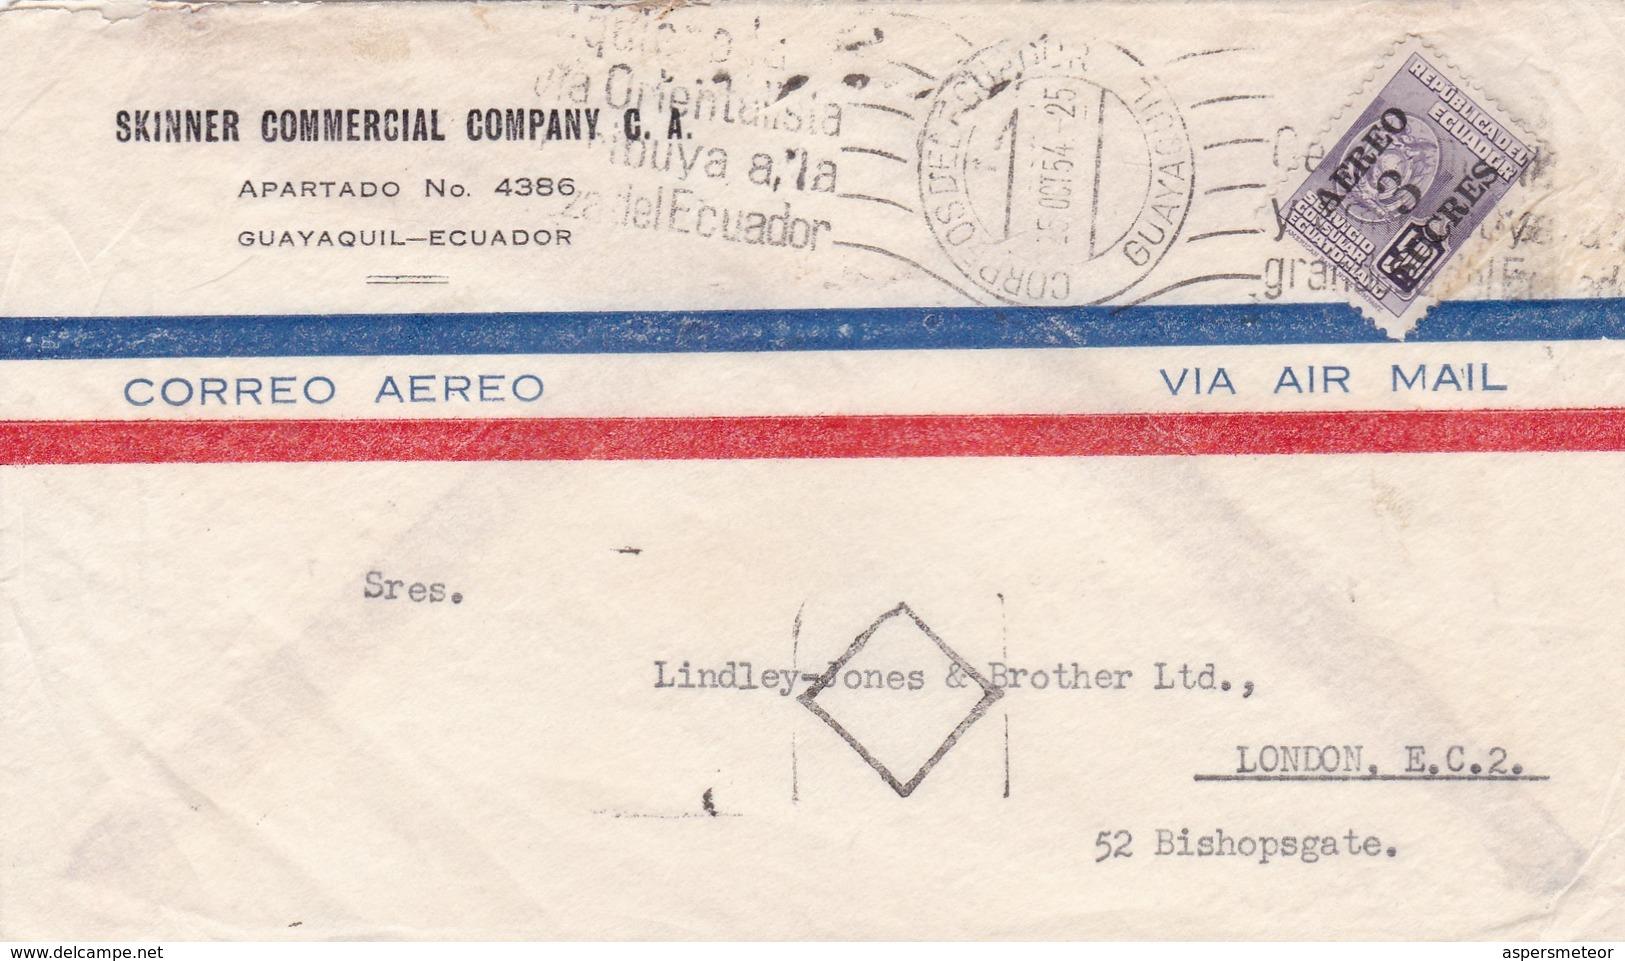 1954 COMMERCIAL COVER- SKINNER COMMERCIAL COMPANY CA. CIRCULEE ECUADOR TO LONDON. STAMP SURCH, BANDELETA PARLANTE- BLEUP - Equateur